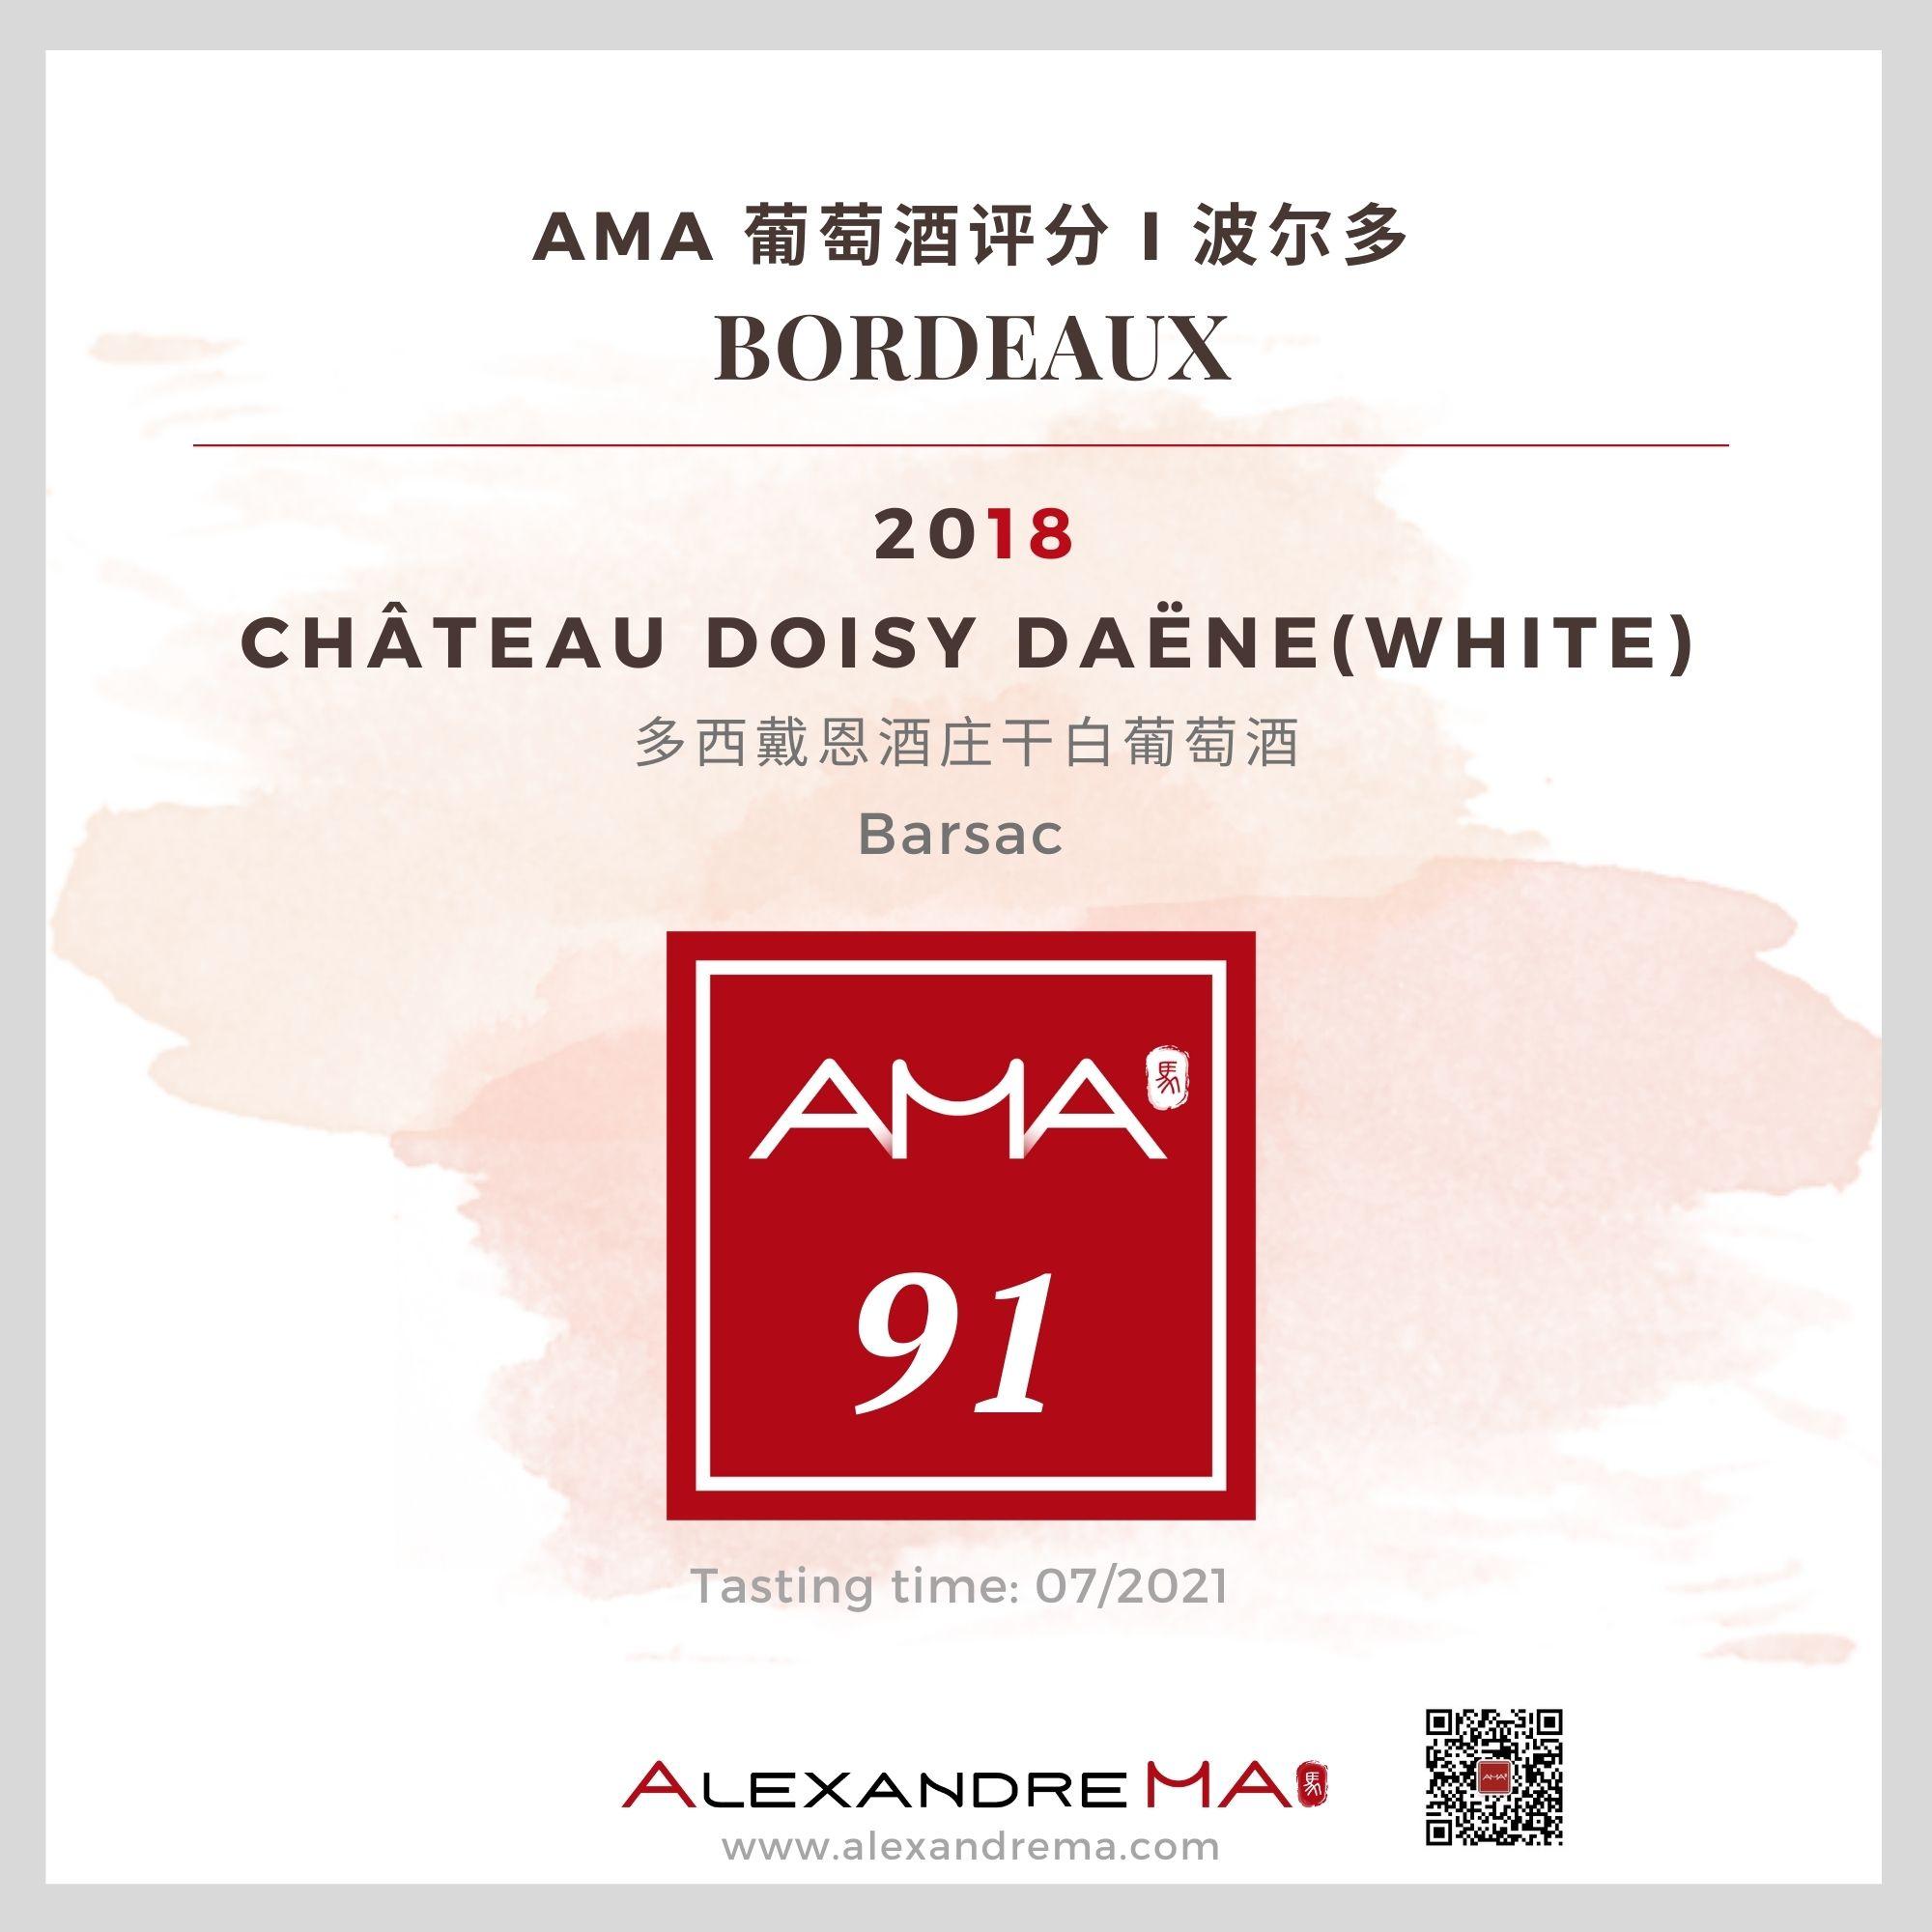 Château Doisy-Daëne White 2018 - Alexandre MA